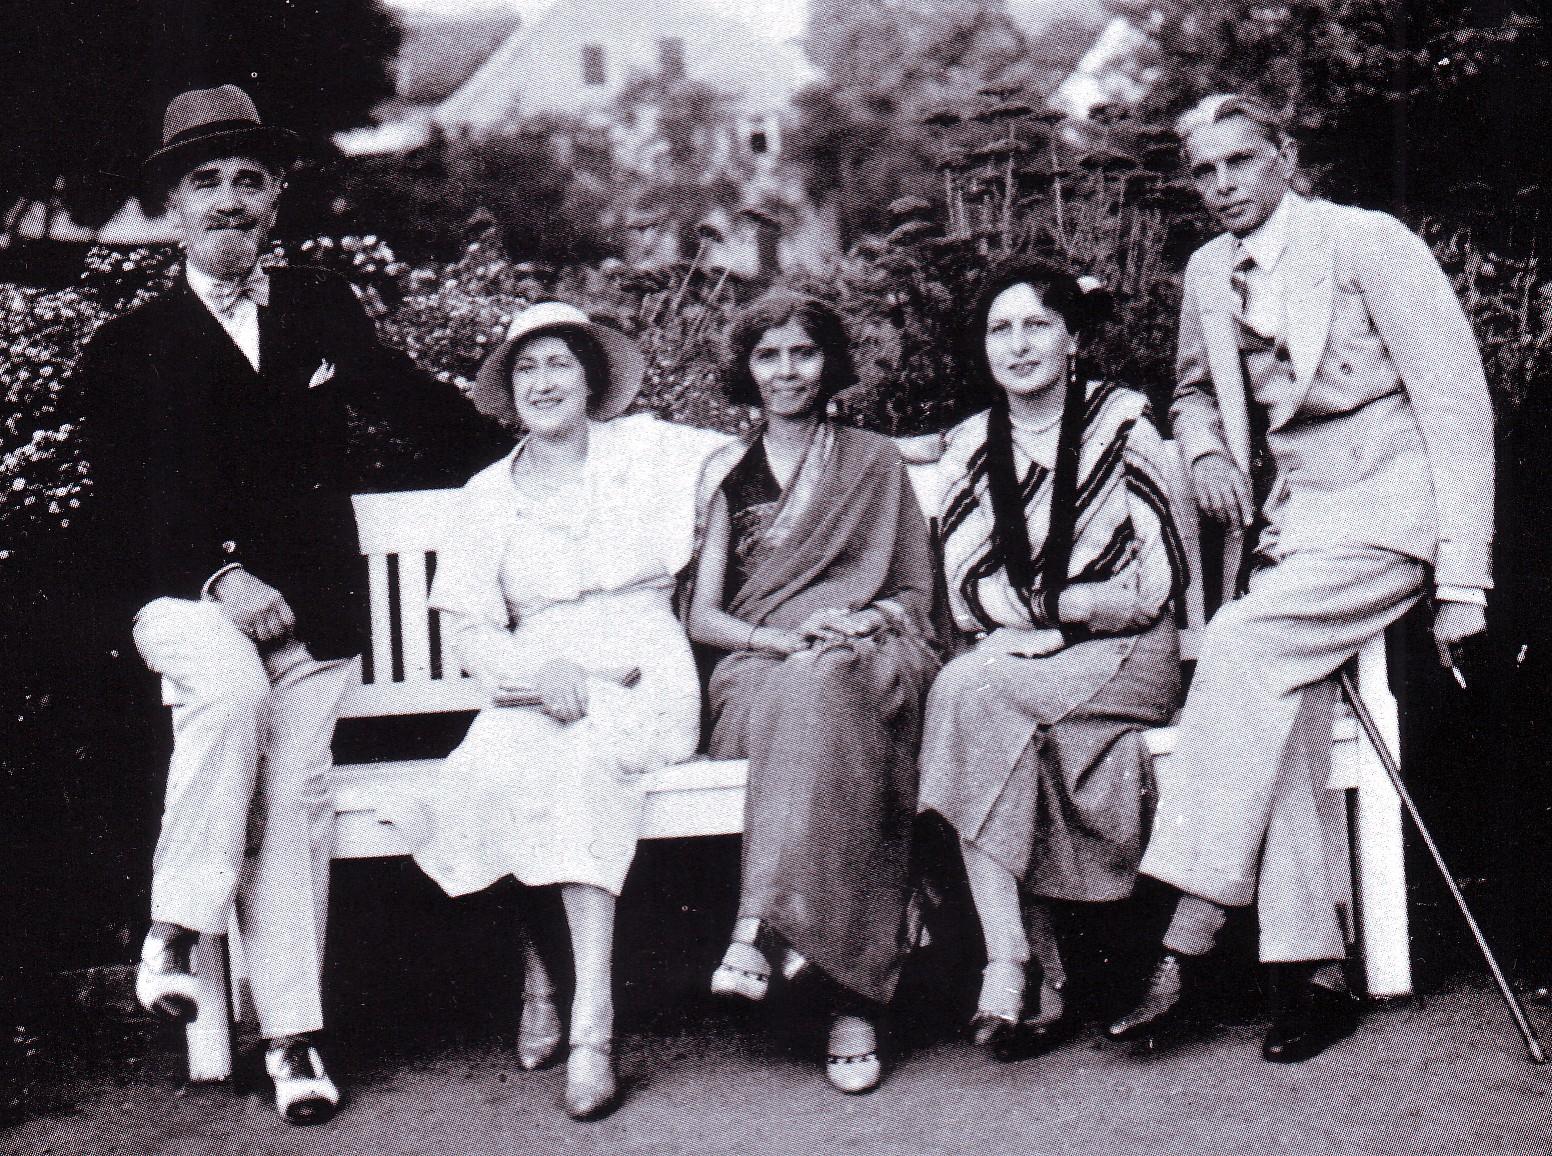 Remembering Quaid-e-Azam Muhammad Ali Jinnah, Pakistan and India should move towards peace